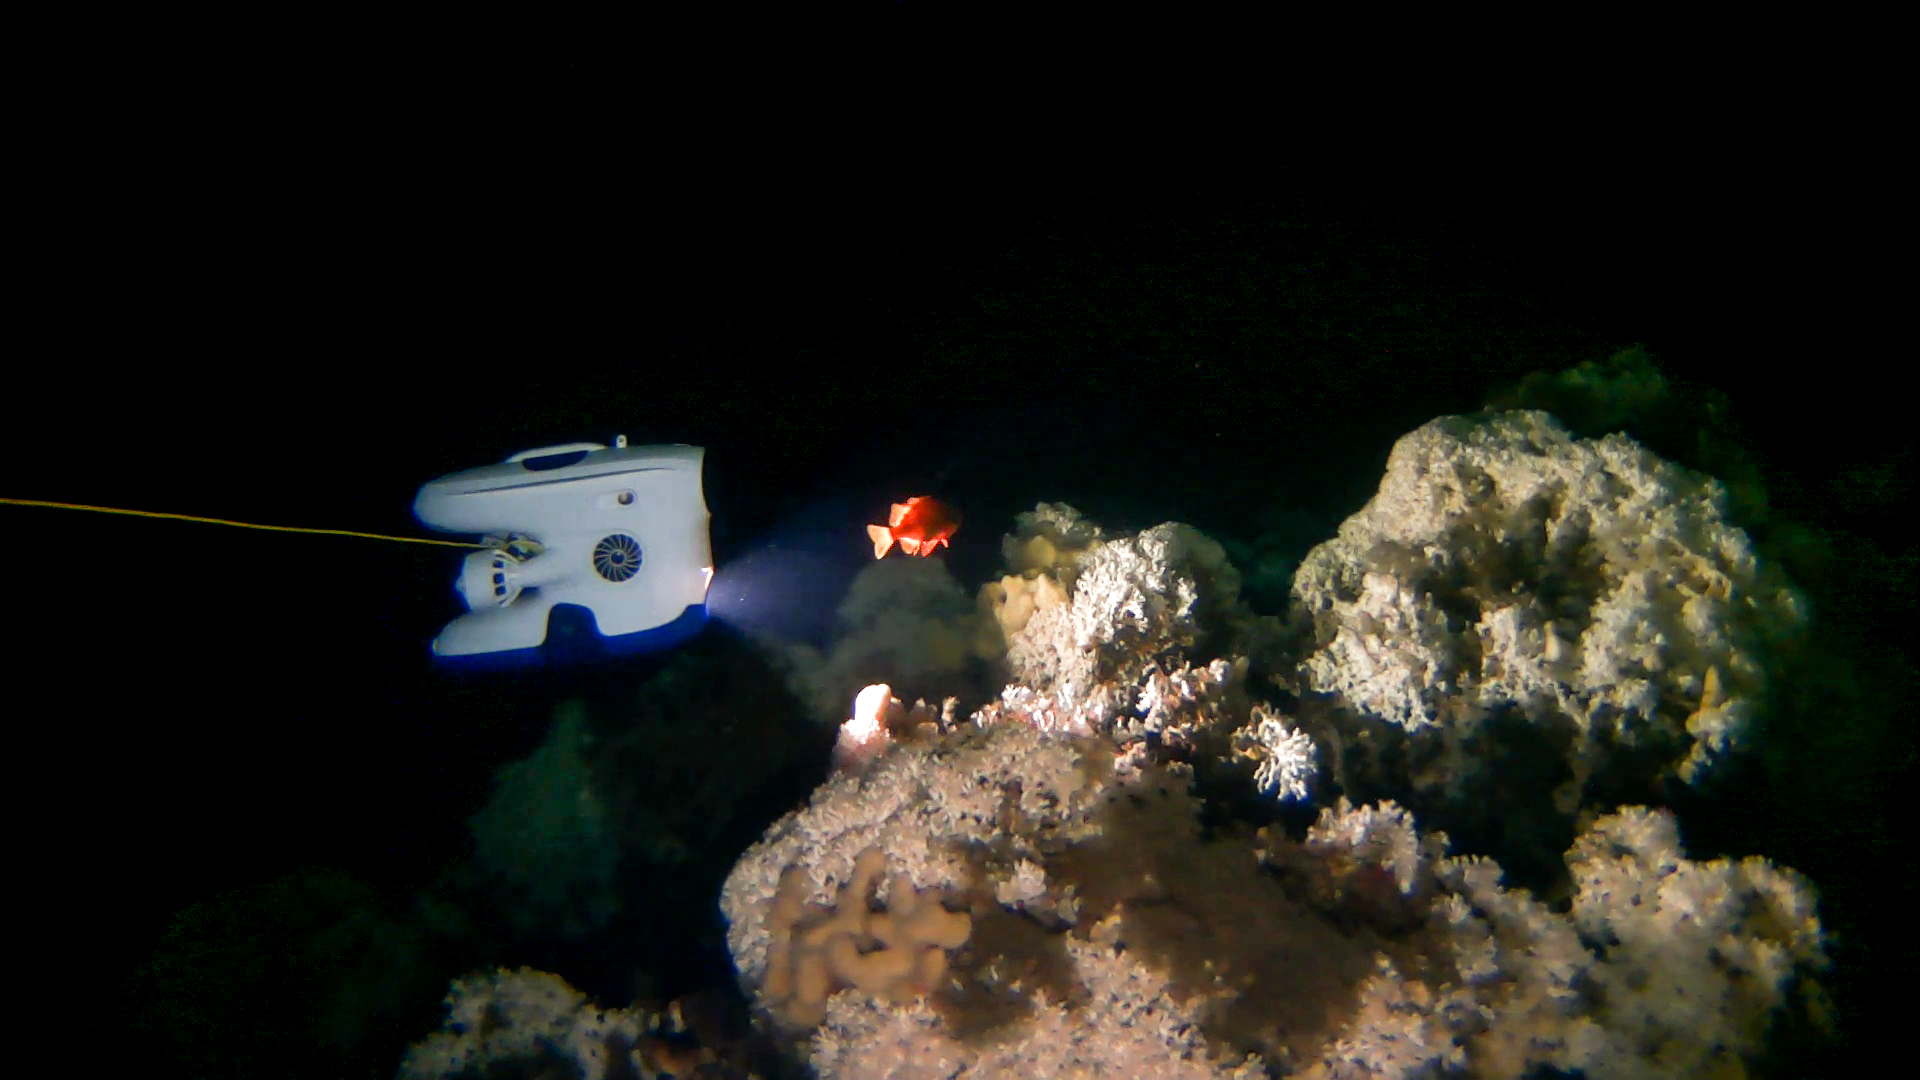 Blueye Pioneer undervannsdronen filming a rosefish (Sebastes viviparus).